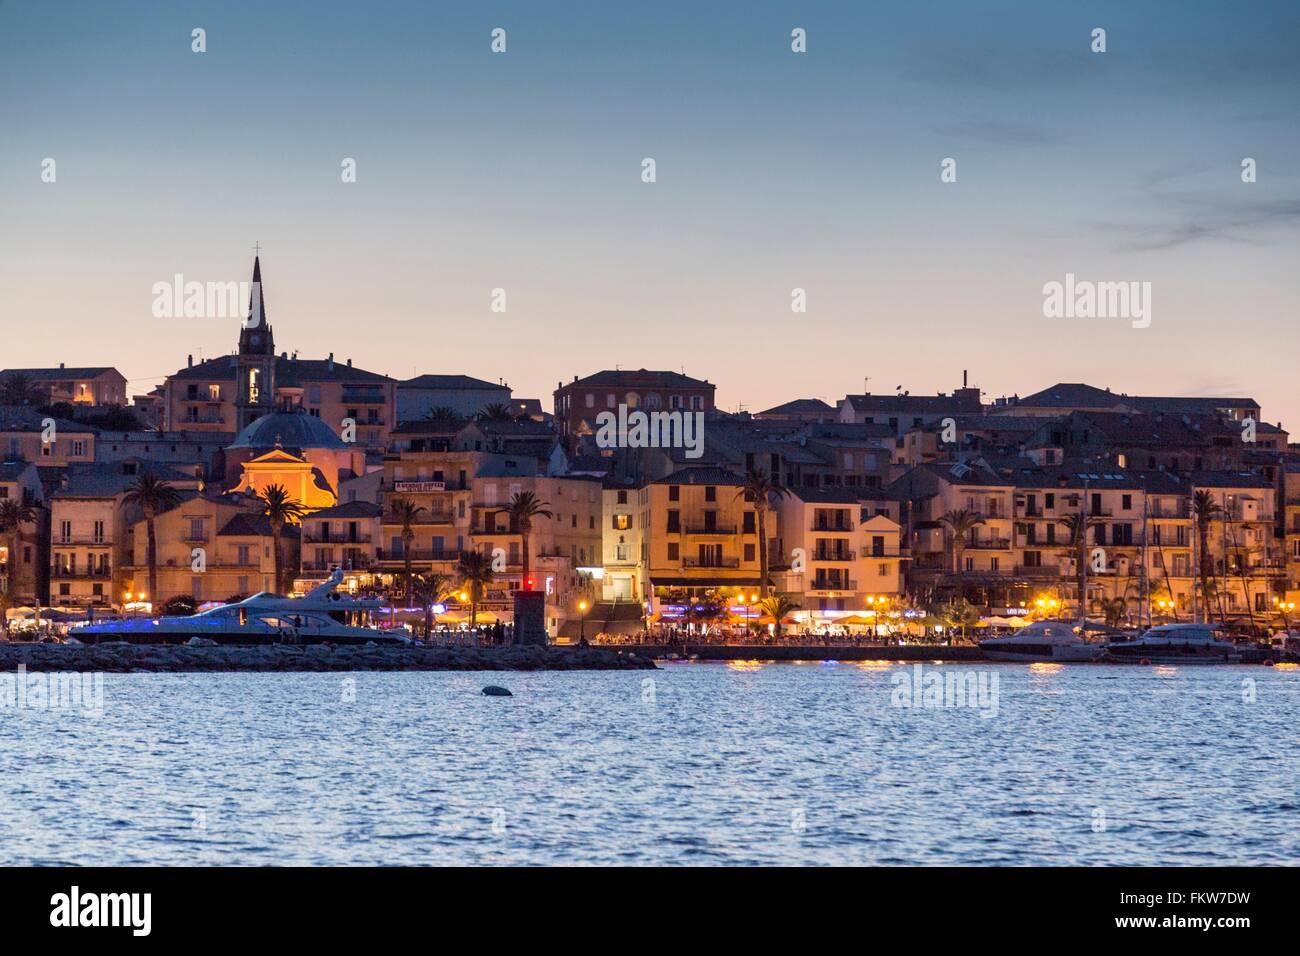 View   sea and Calvi city lights at dusk, Corsica, France - Stock Image